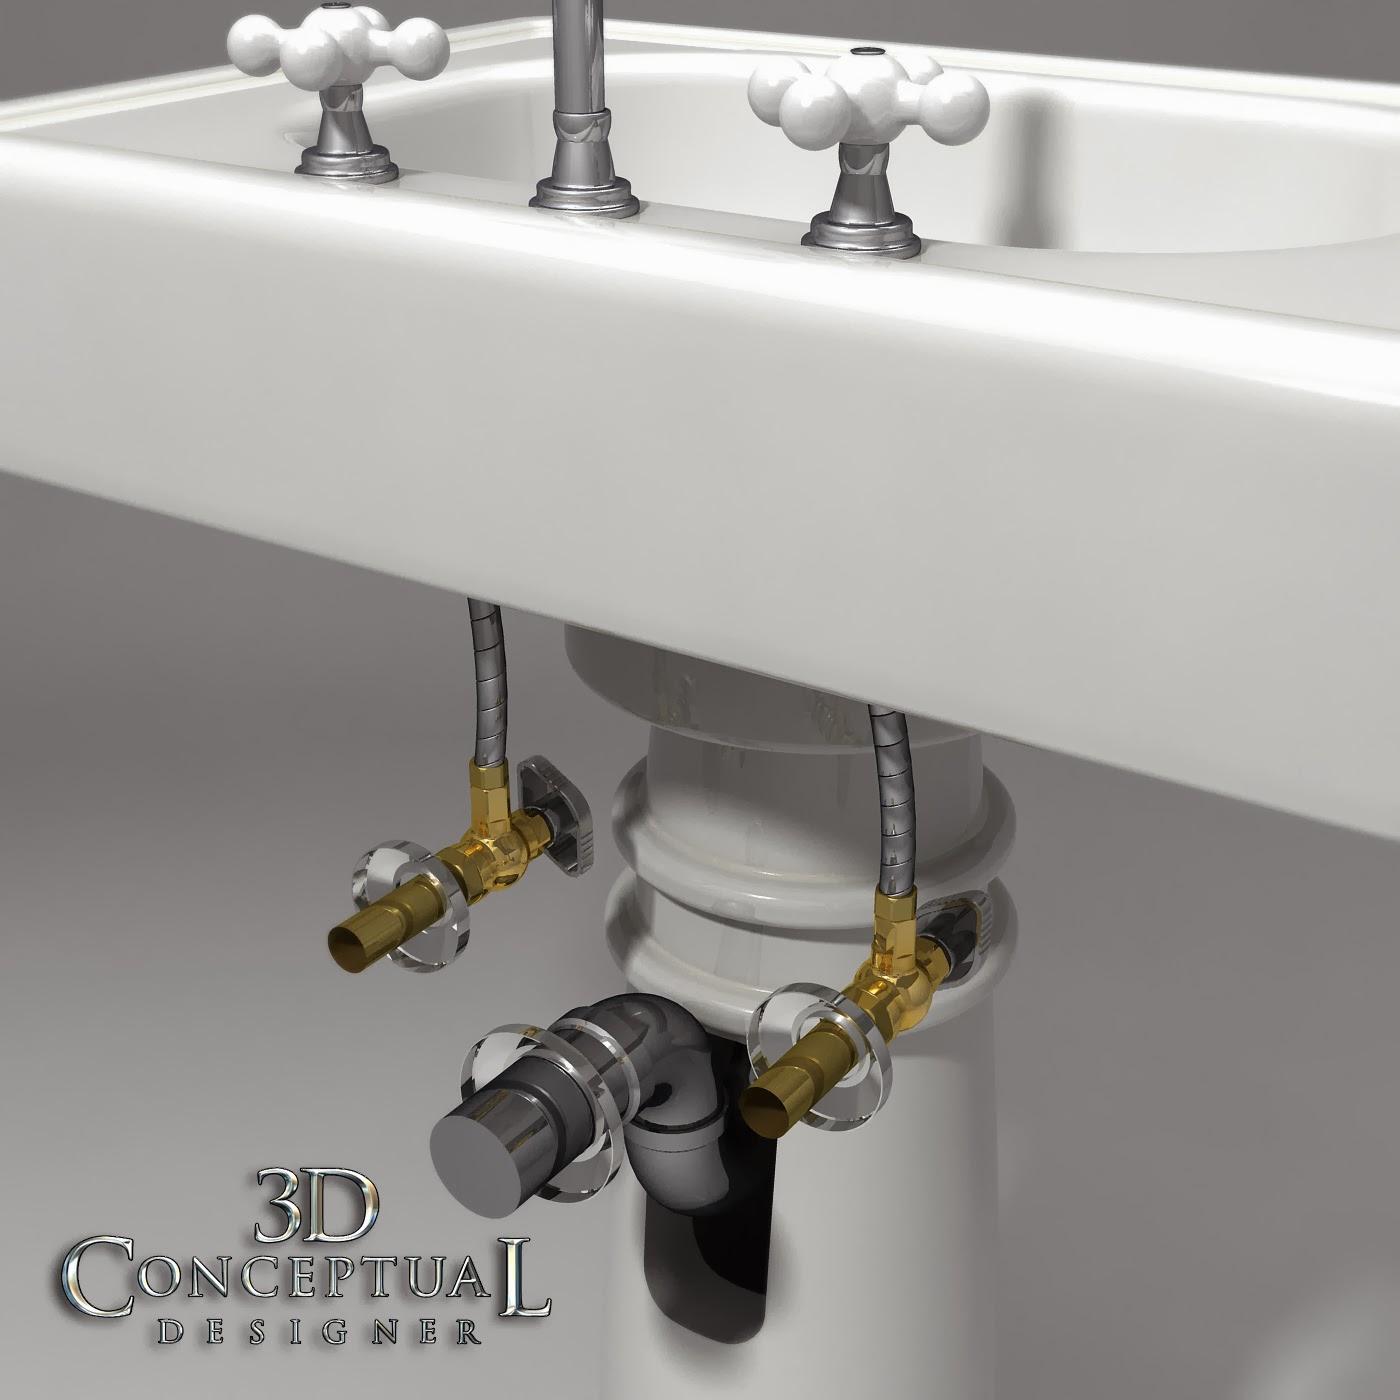 1920 Pedestal Sink : ... : 3D Stock Model Build Review: 1920s Pedestal Sink 2005